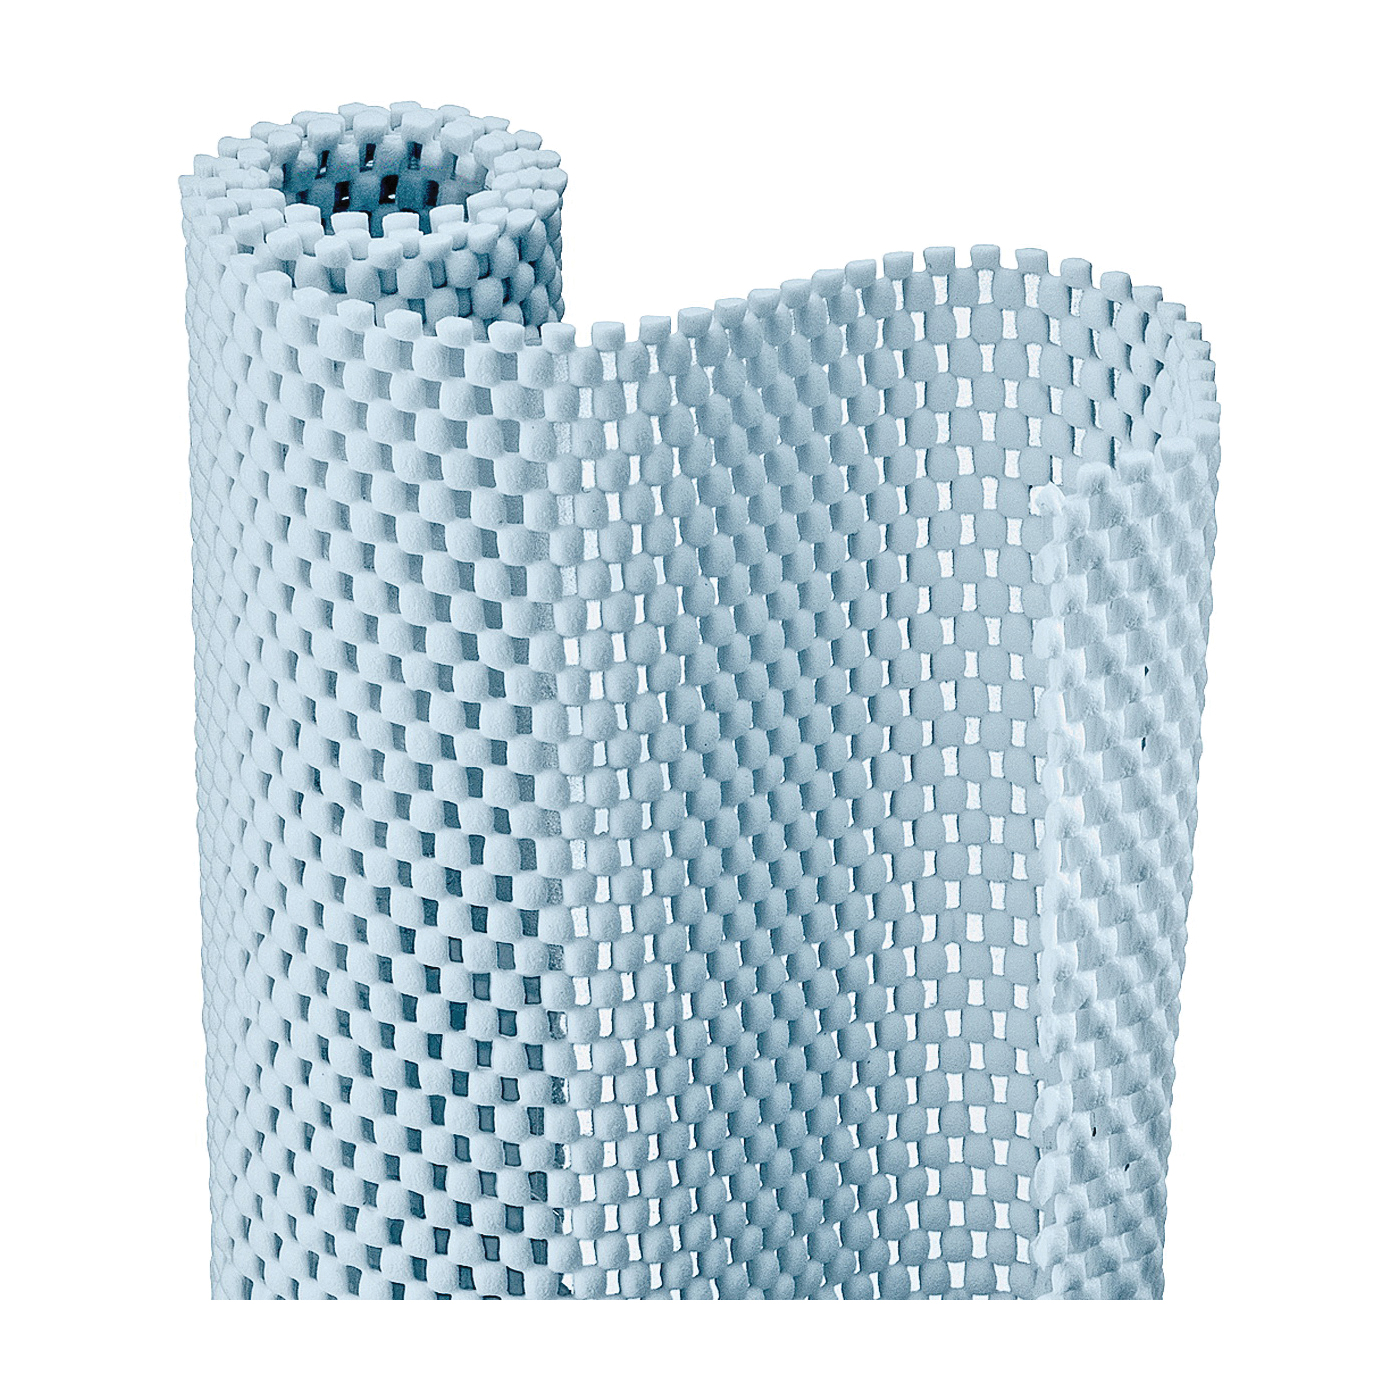 Picture of Con-Tact 04F-C6O52-06 Shelf Liner, 4 ft L, 20 in W, Foam/PVC, Bright White